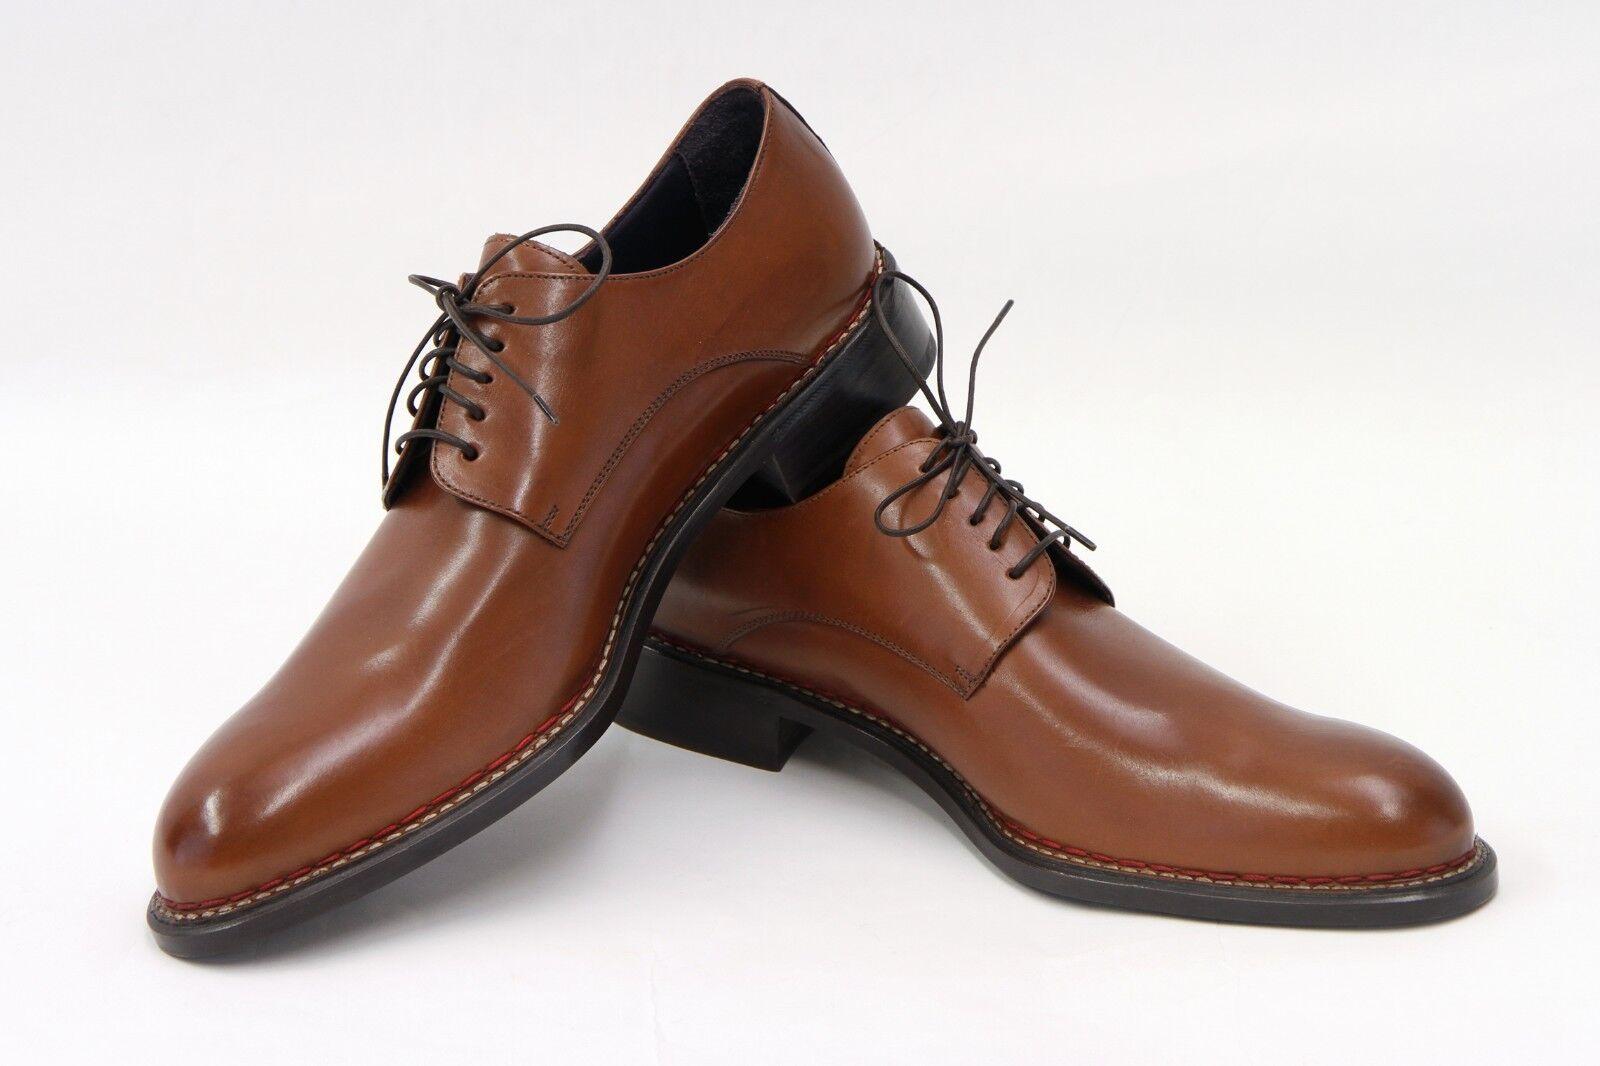 NWOB ISAIA NAPOLI uomo 100% LEATHER COGNAC Marroneee LACE-UP DERBY DRESS scarpe